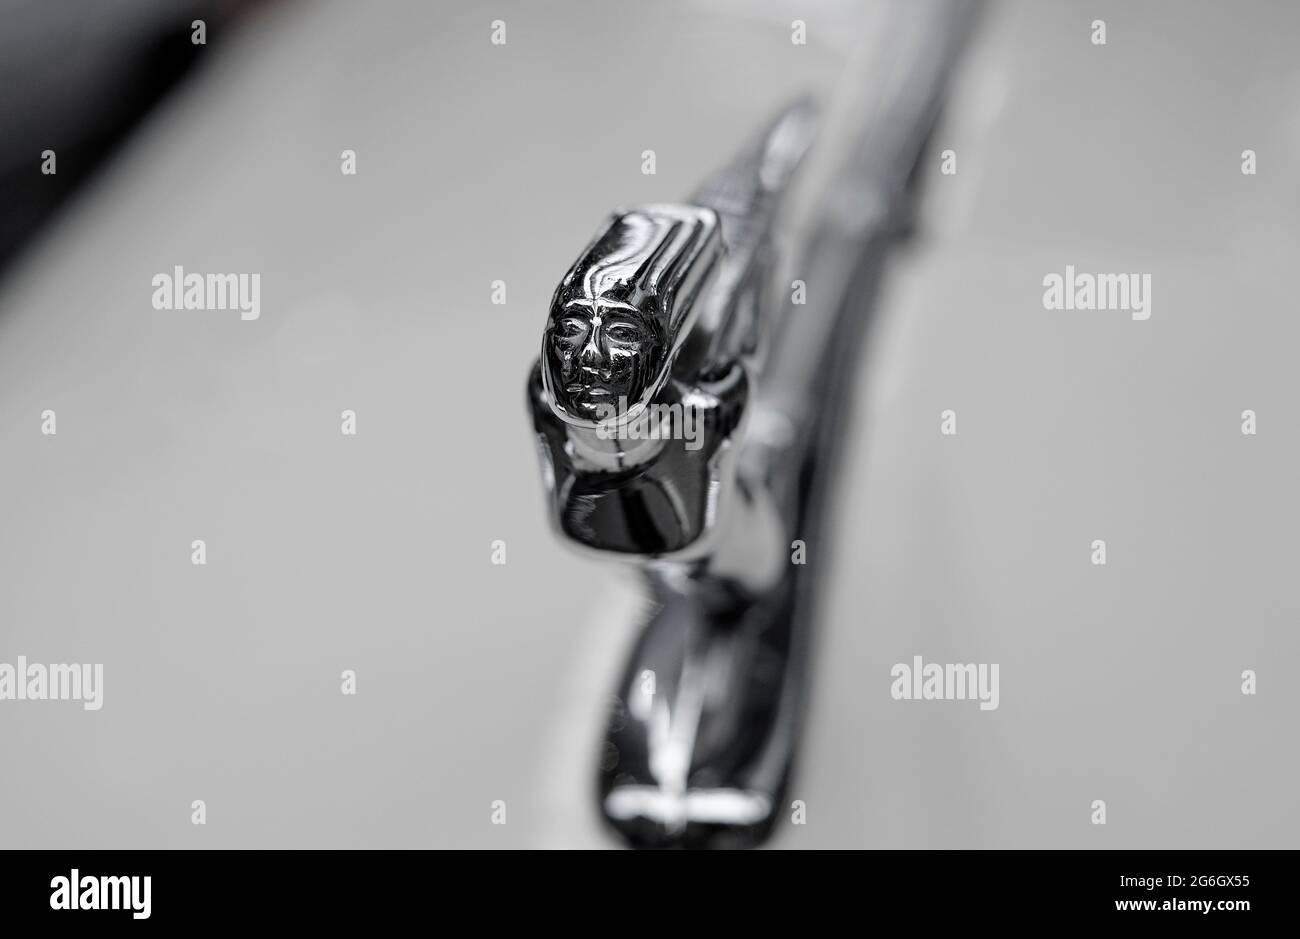 flying lady mascot on an auburn 851 speedster car Stock Photo